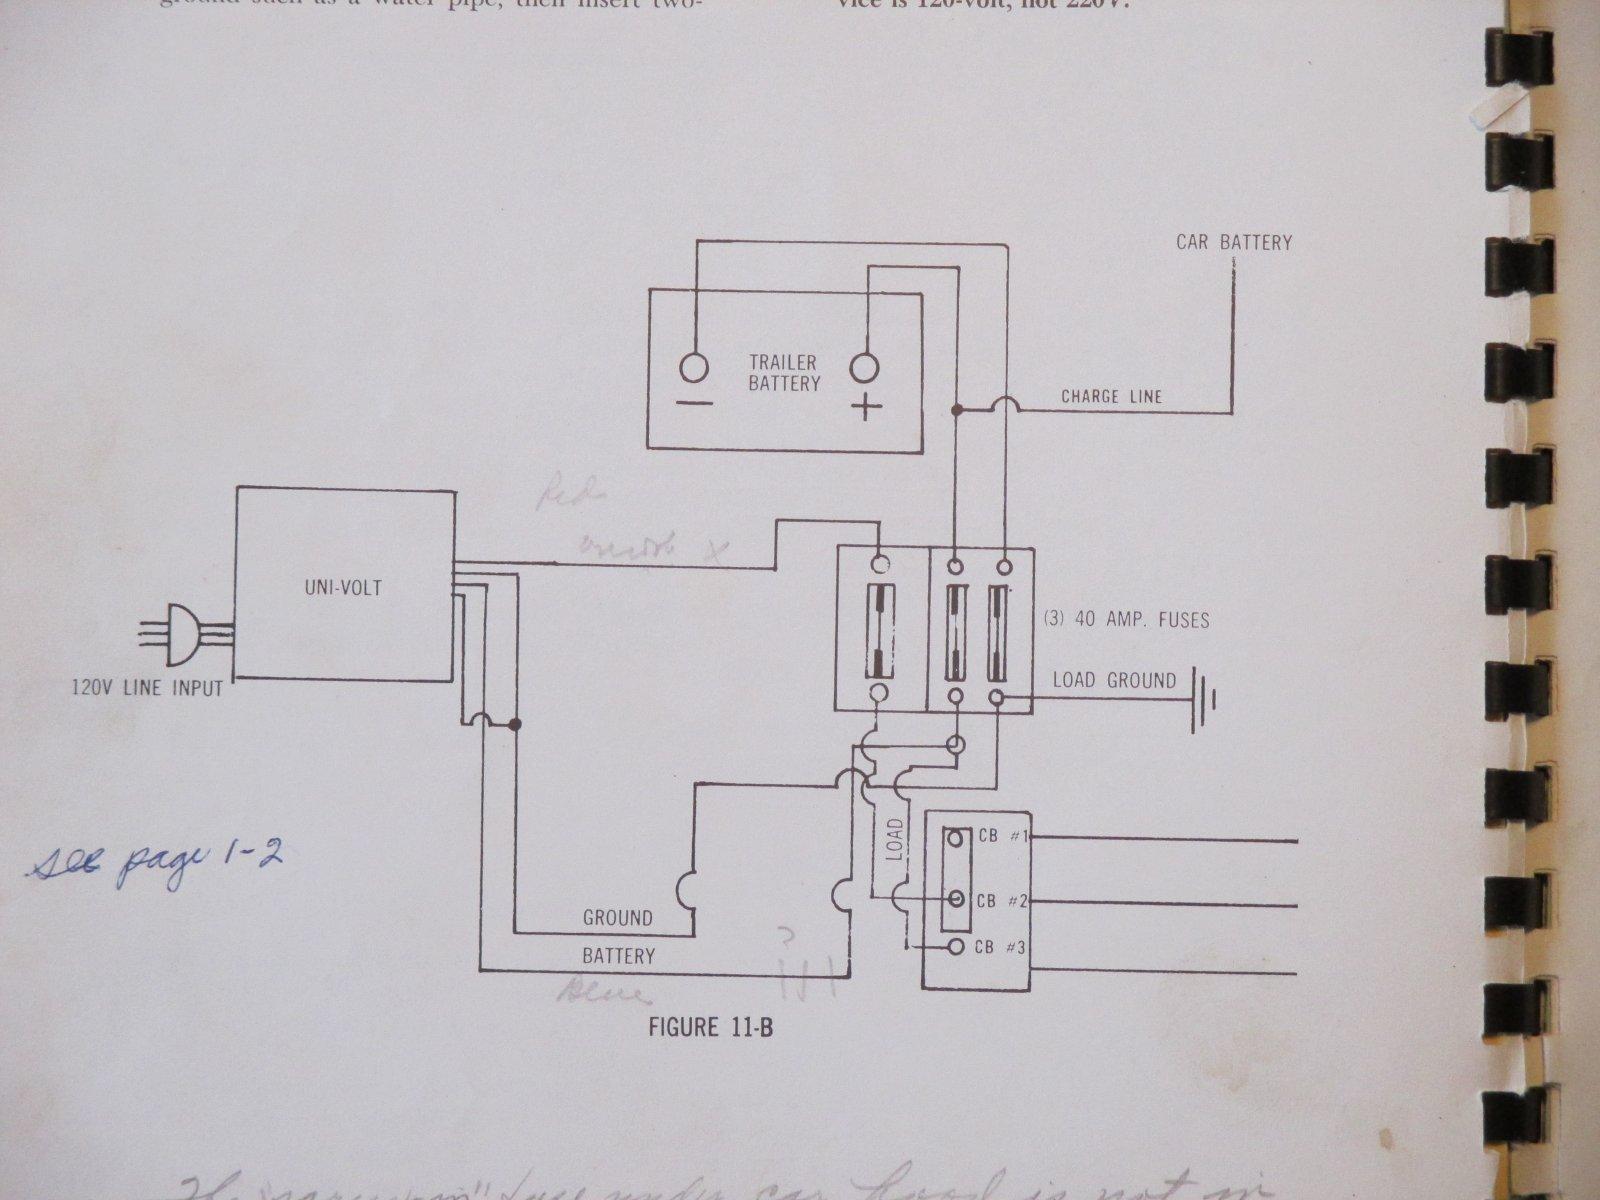 HY_9862] Airstream Trailer Wiring Diagram Wiring DiagramUnpr Tixat Numap Argu Rious Aeocy Spoat Jebrp Proe Hendil Mohammedshrine  Librar Wiring 101